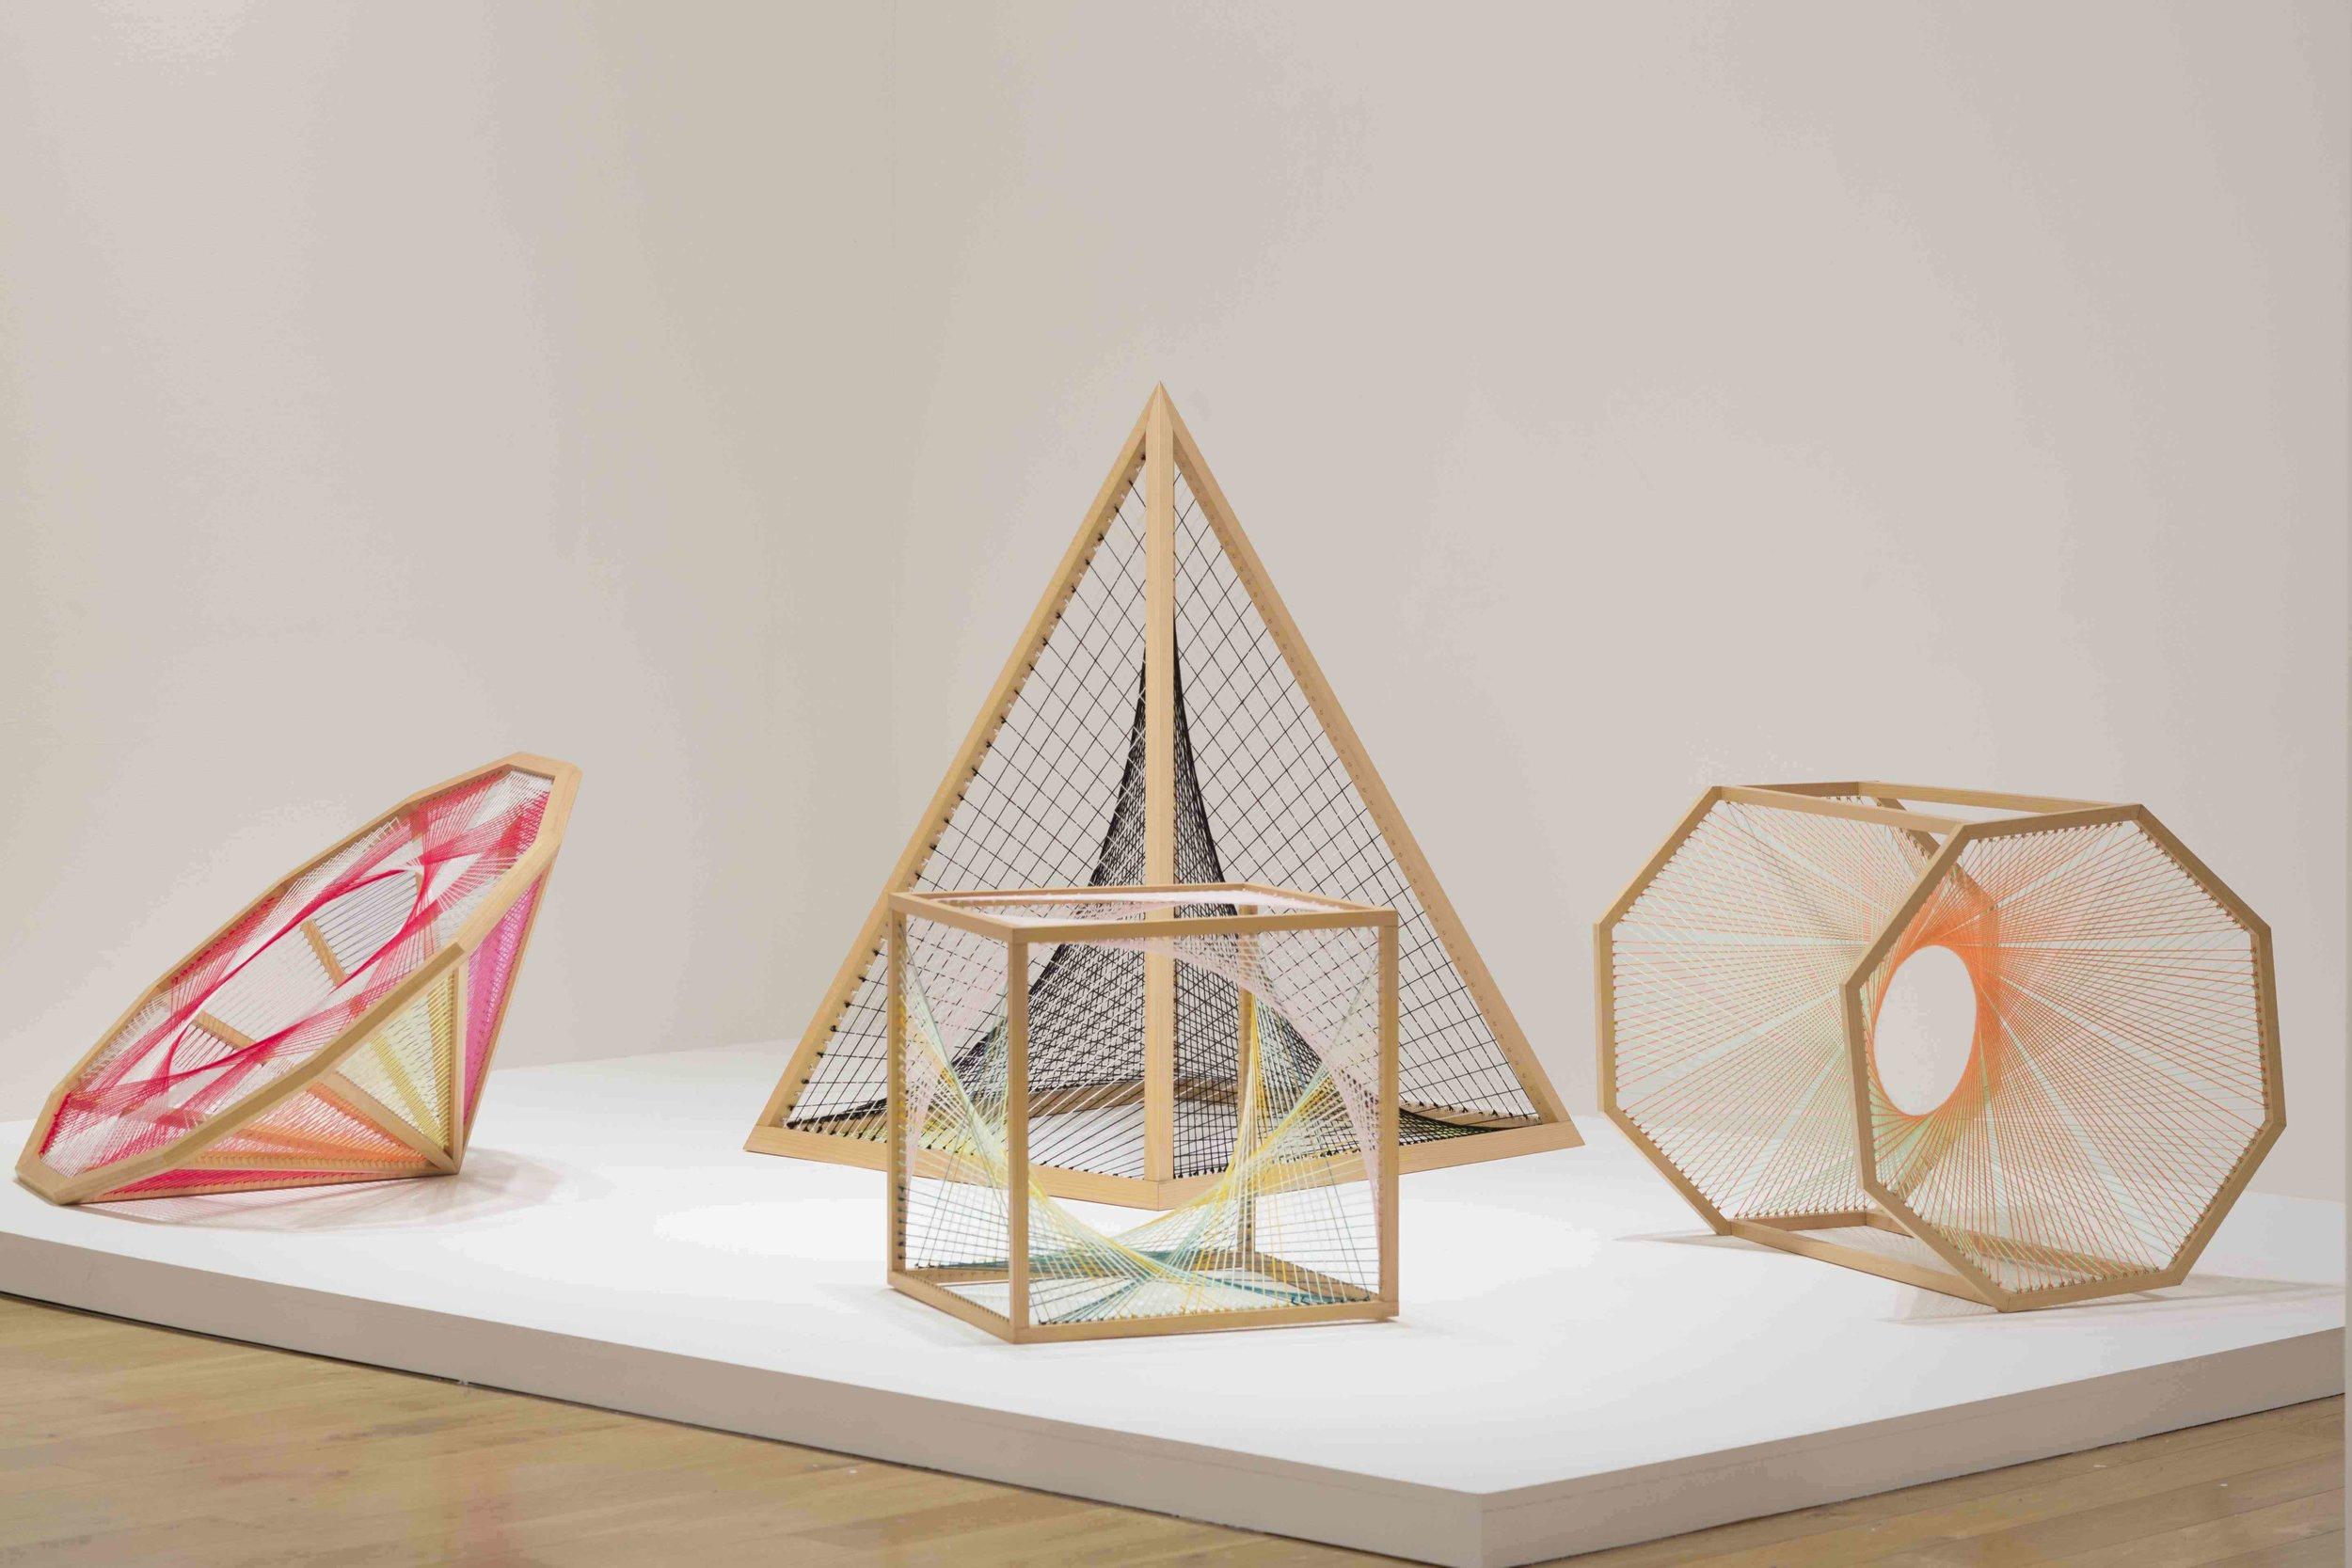 NIKE SAVVAS   Sliding Ladder: Dihexagonal #1,Sliding Ladder: Pyramid #2,Sliding ladder: Cube #1,Sliding ladder: Octagonal Prism #1  2010 Wood, wool, steel Dimensions variable